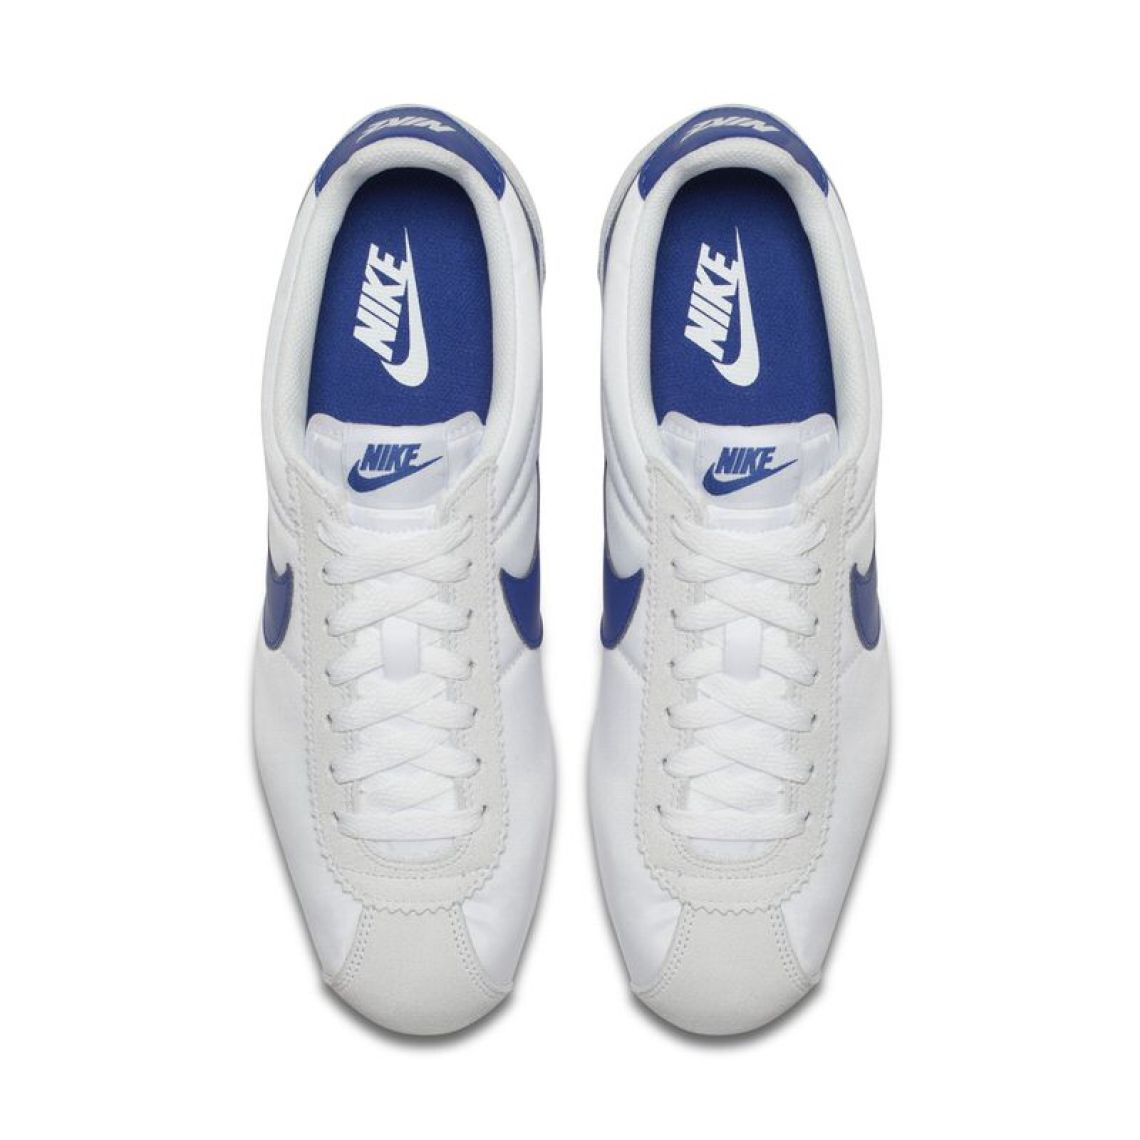 Nike Classic Cortez White/Gym Blue